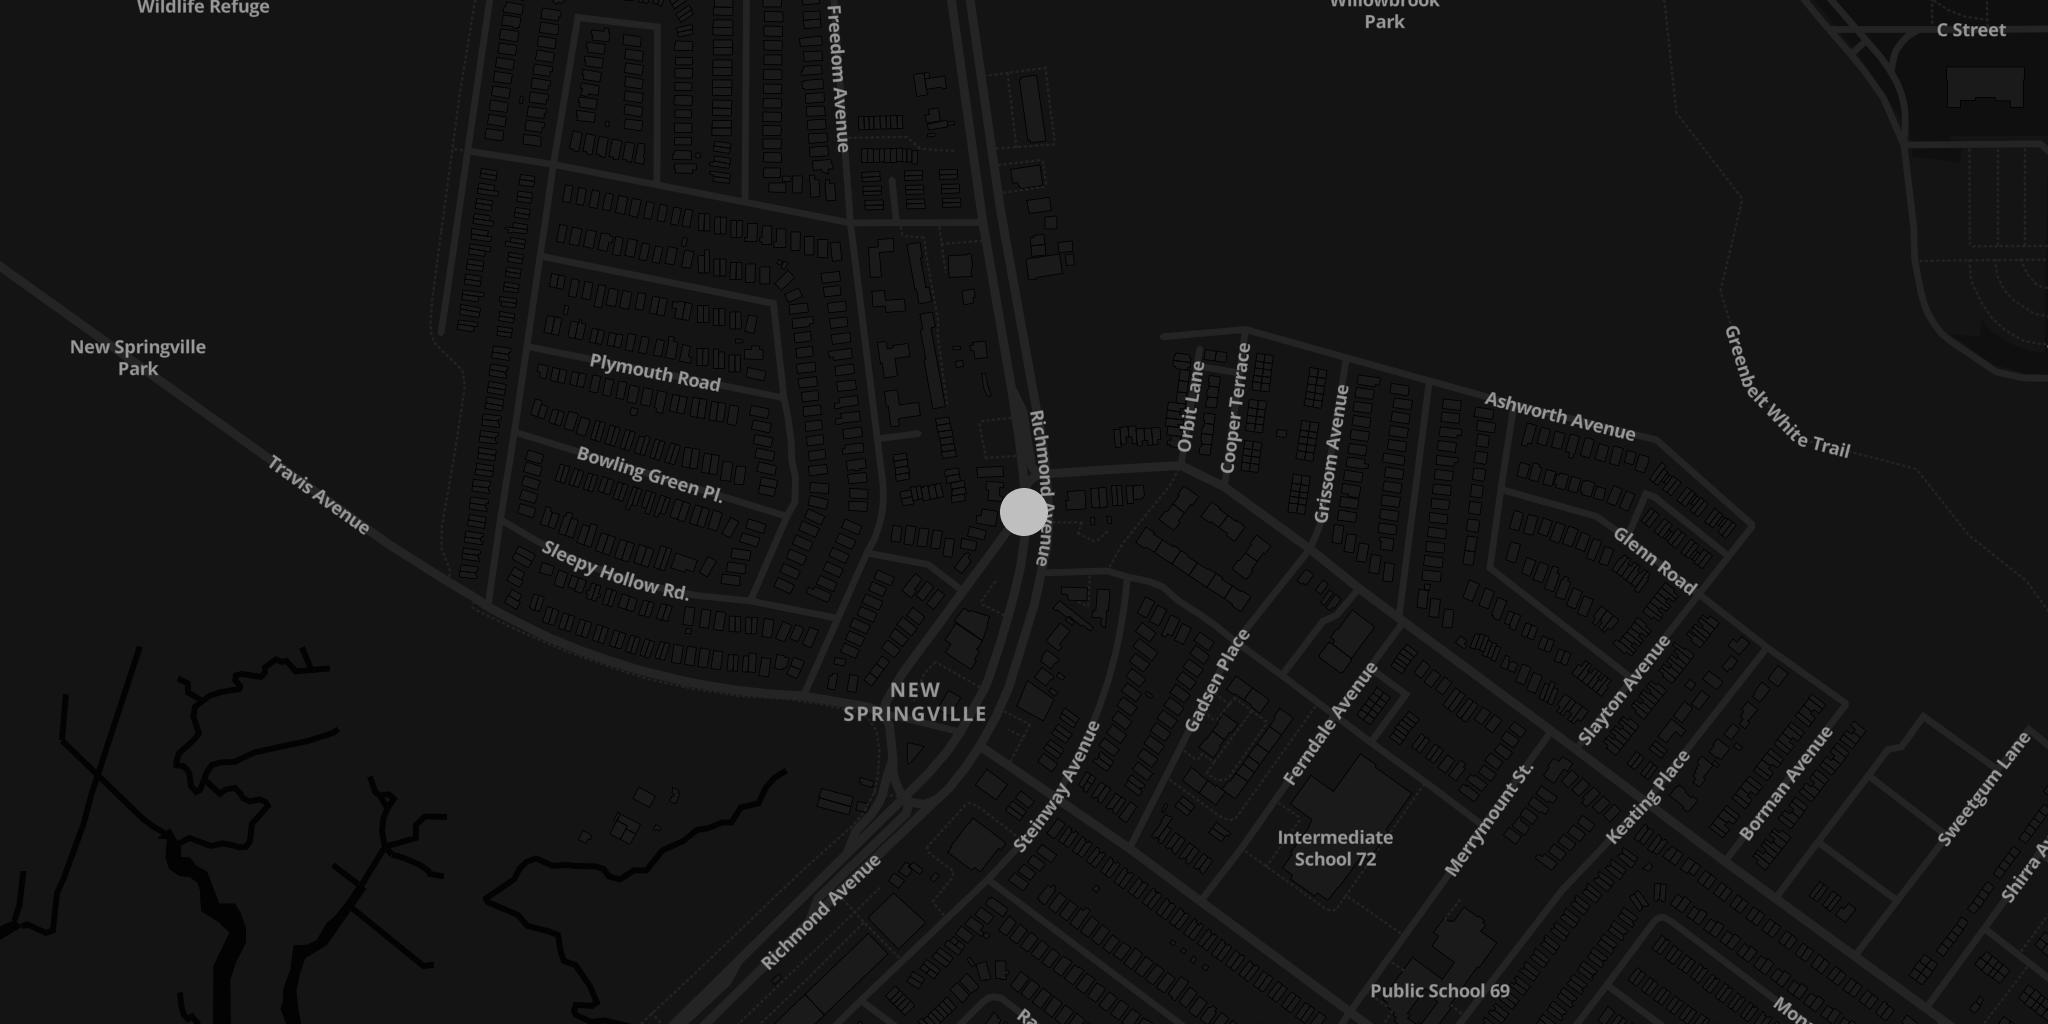 Pedestrian Struck by Vehicle @Citizen   Instant 911 Crime ... on